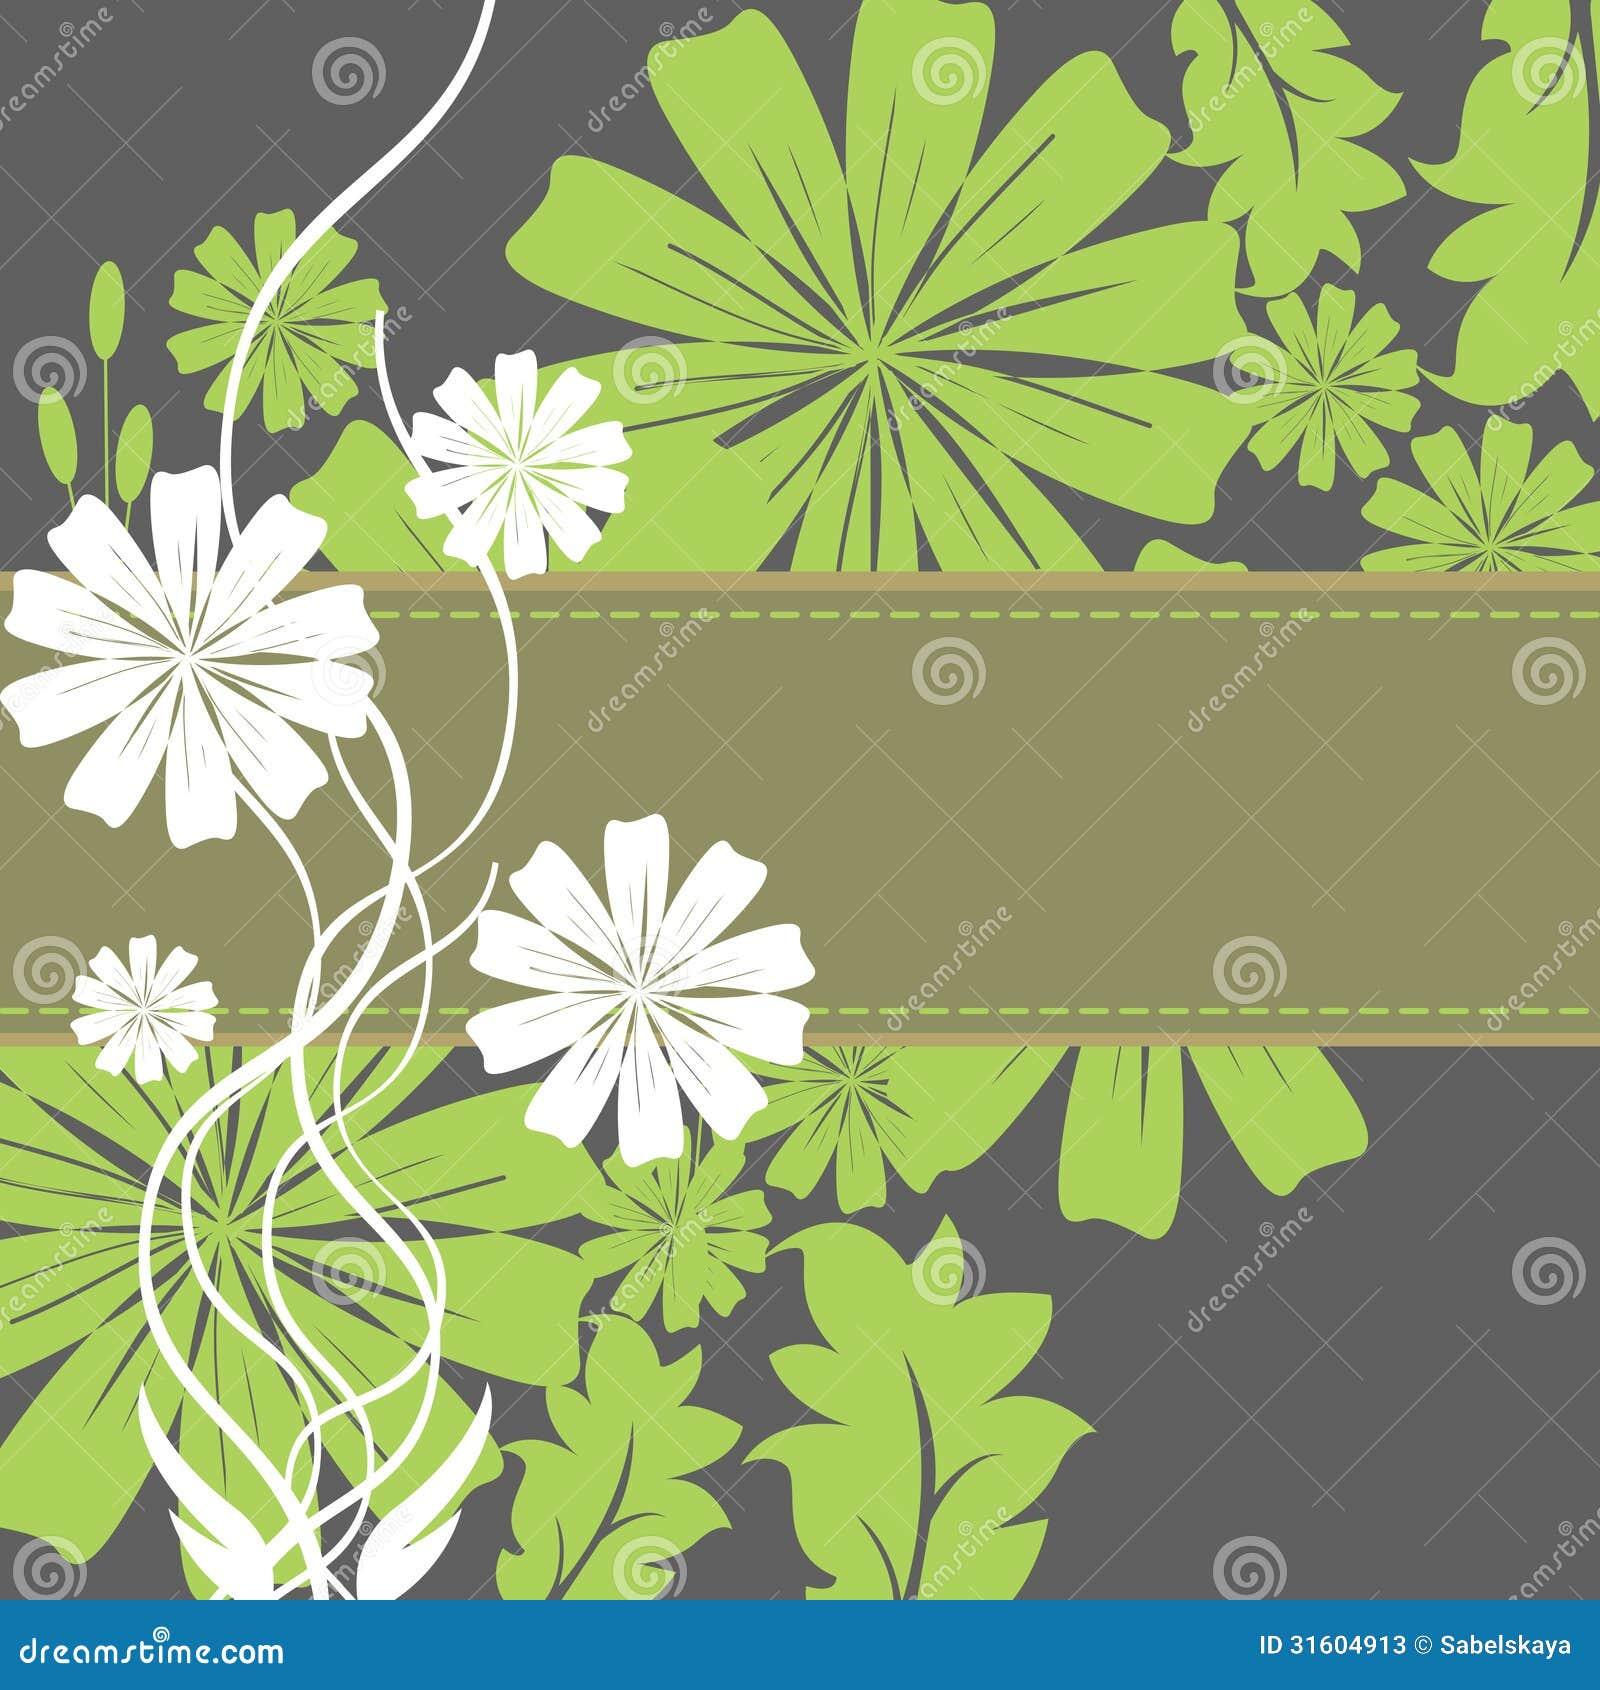 Frühlings-Blumen-und Blatt-Rahmen Vektor Abbildung - Illustration ...